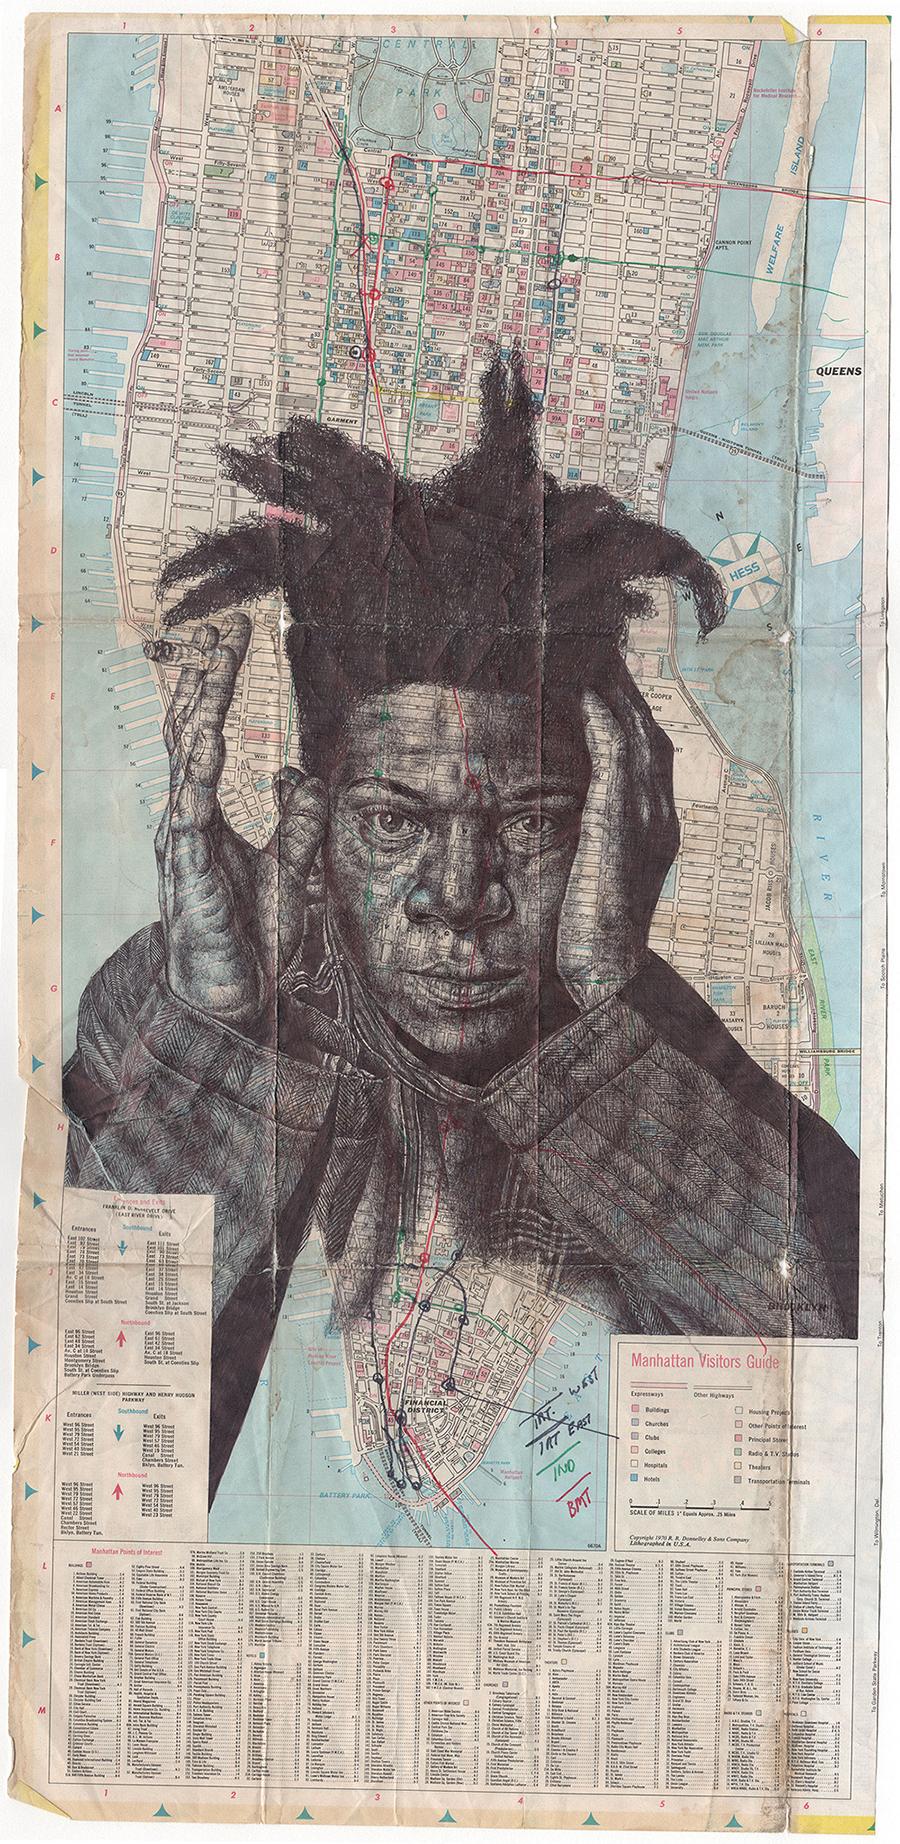 Illustration: Bic Biro Drawings on Antique Maps